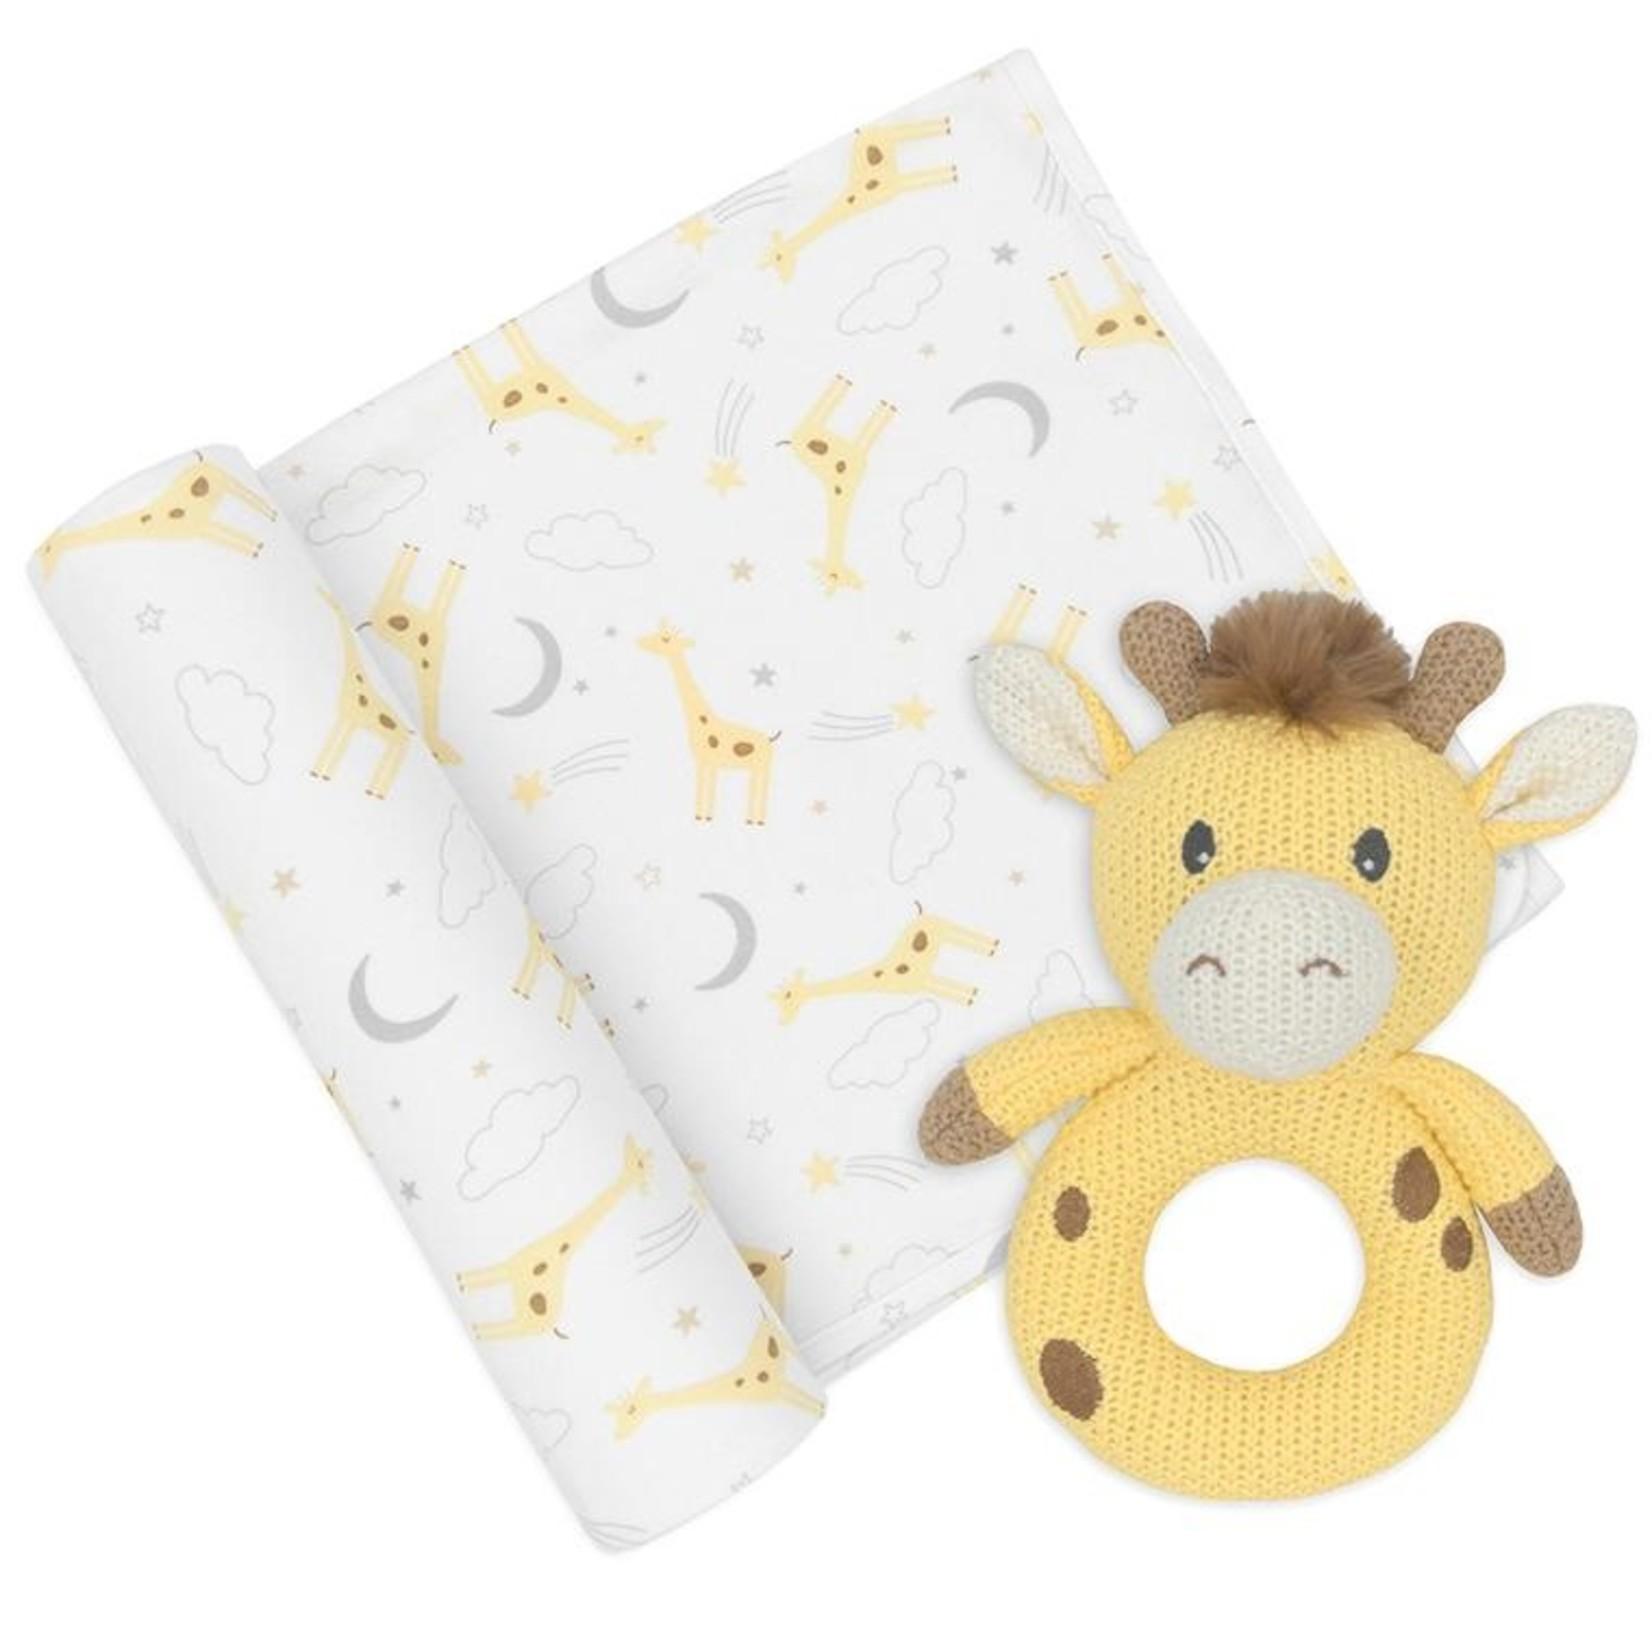 Living Textiles living Textiles Jersey Swaddle & Rattle - Noah/Giraffe